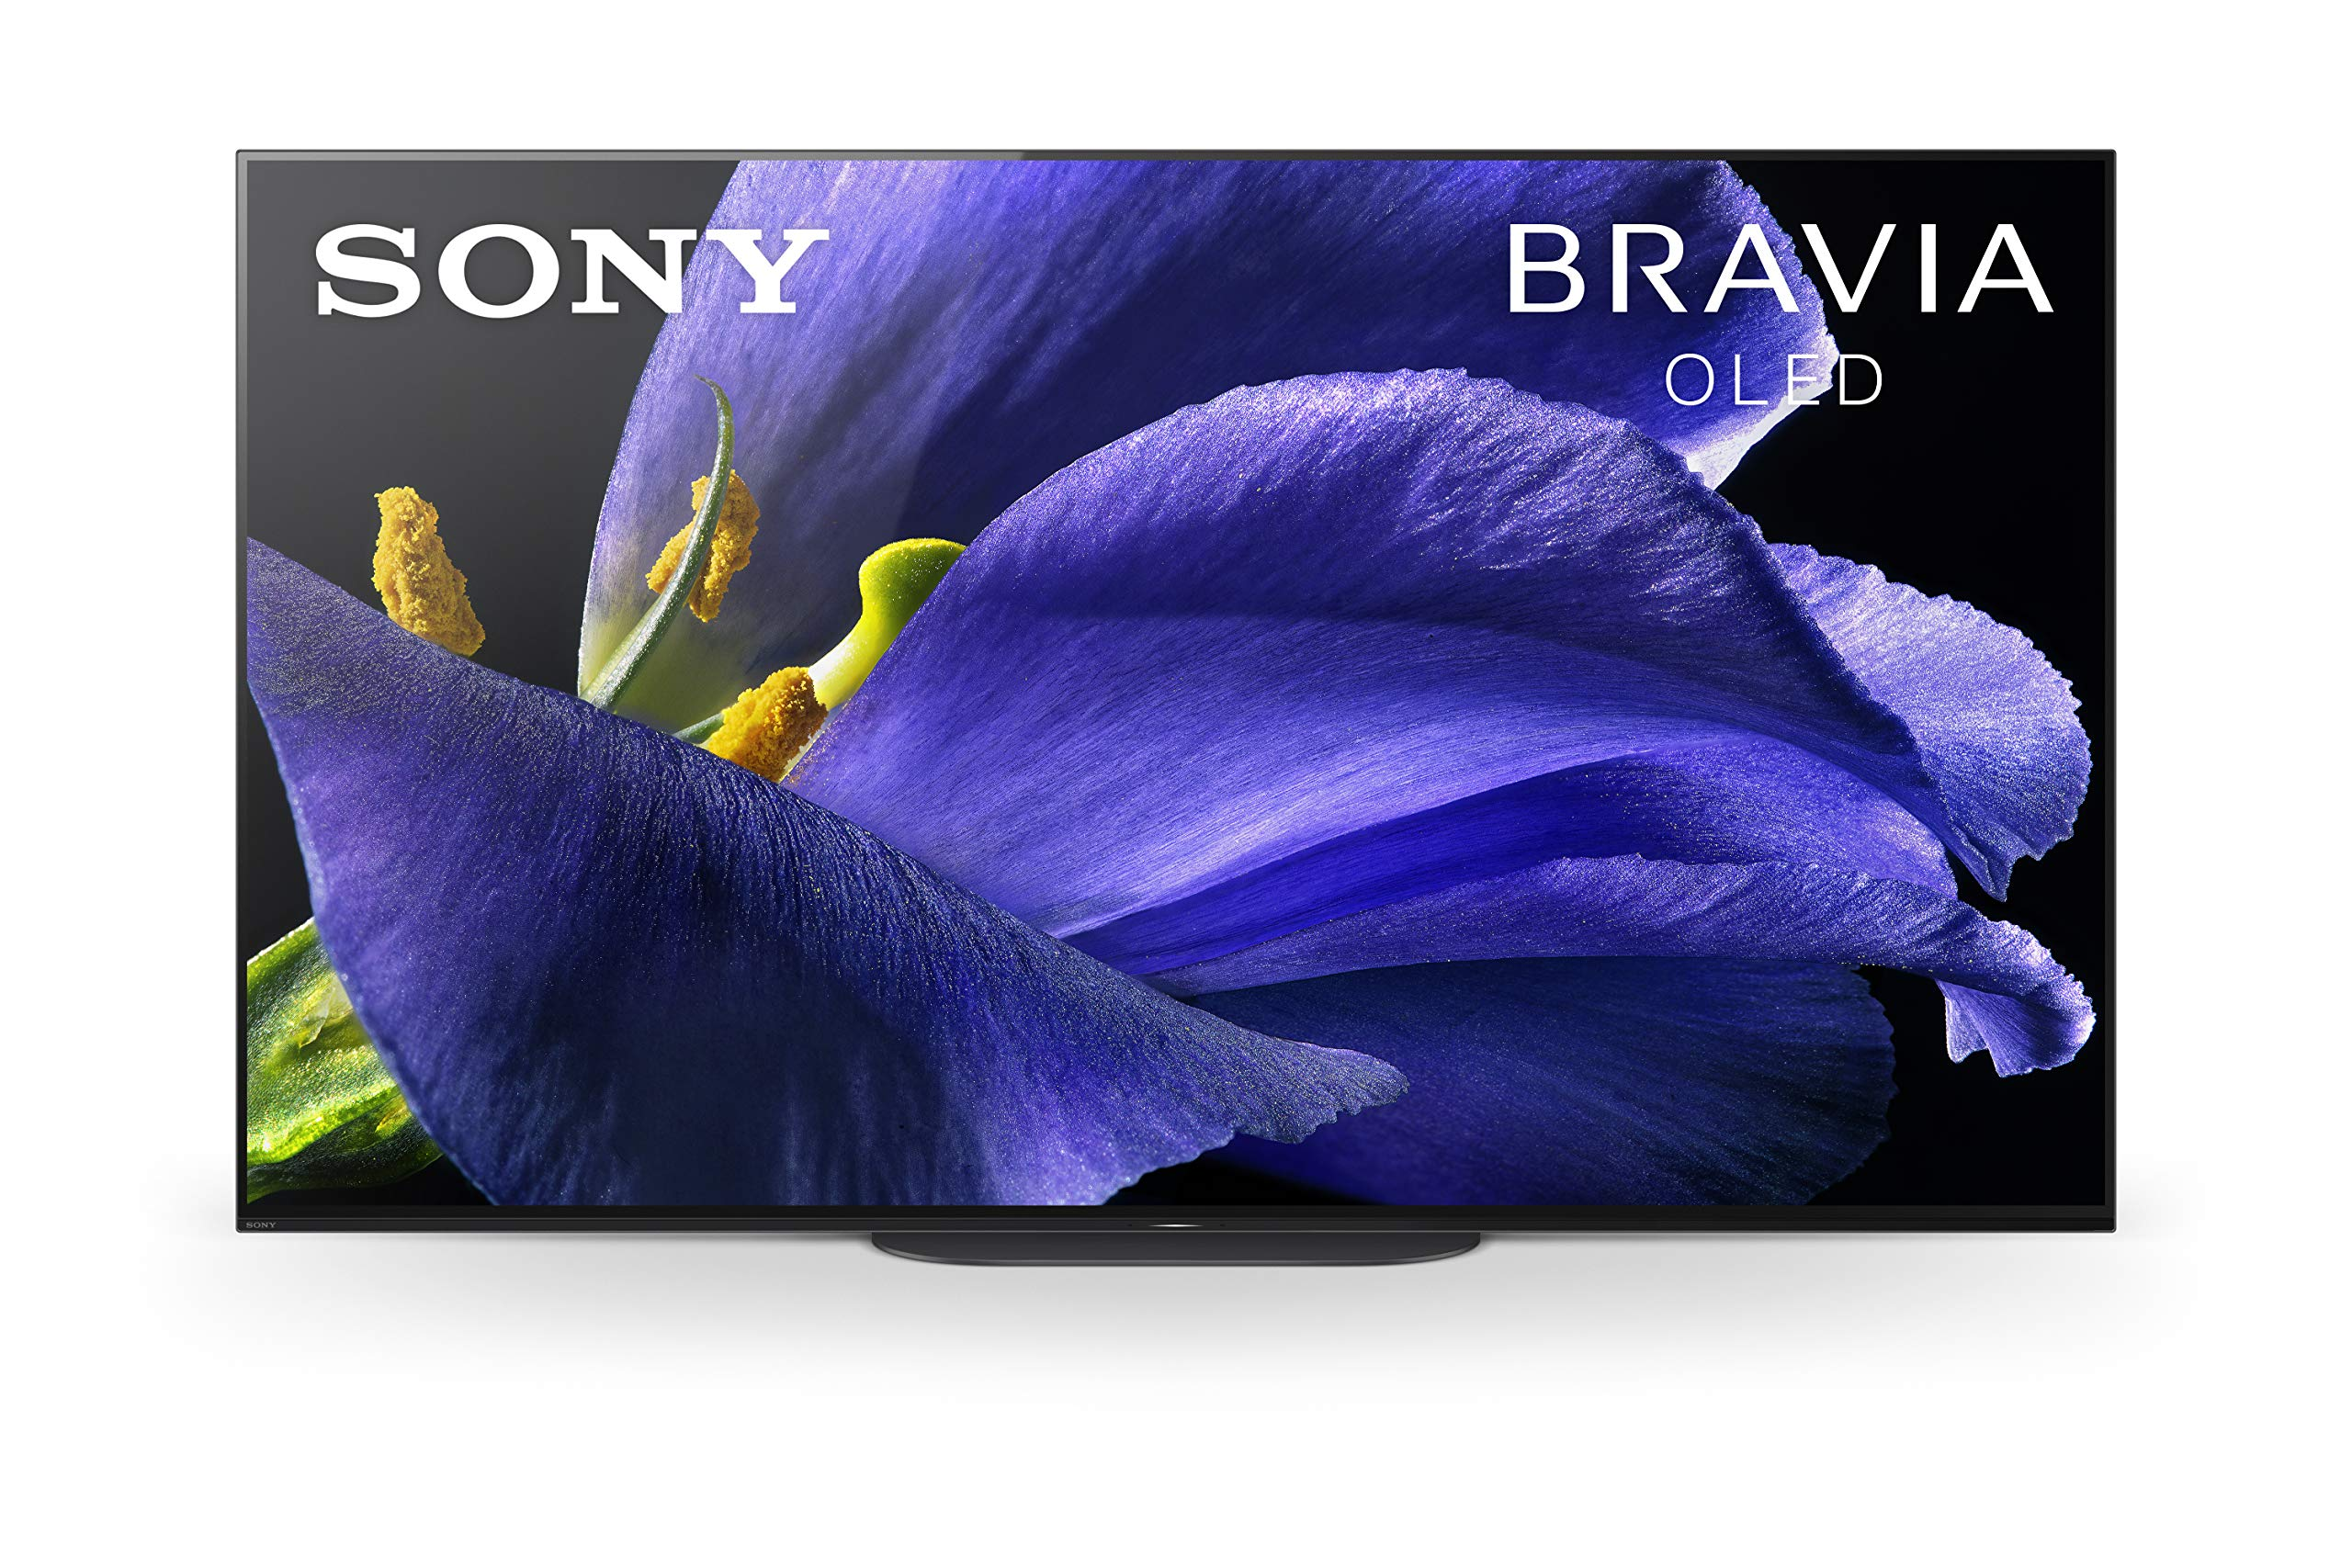 Sony XBR-65A9G 4K Ultra HD Smart Master Series BRAVIA OLED TV (2019 Model) 1